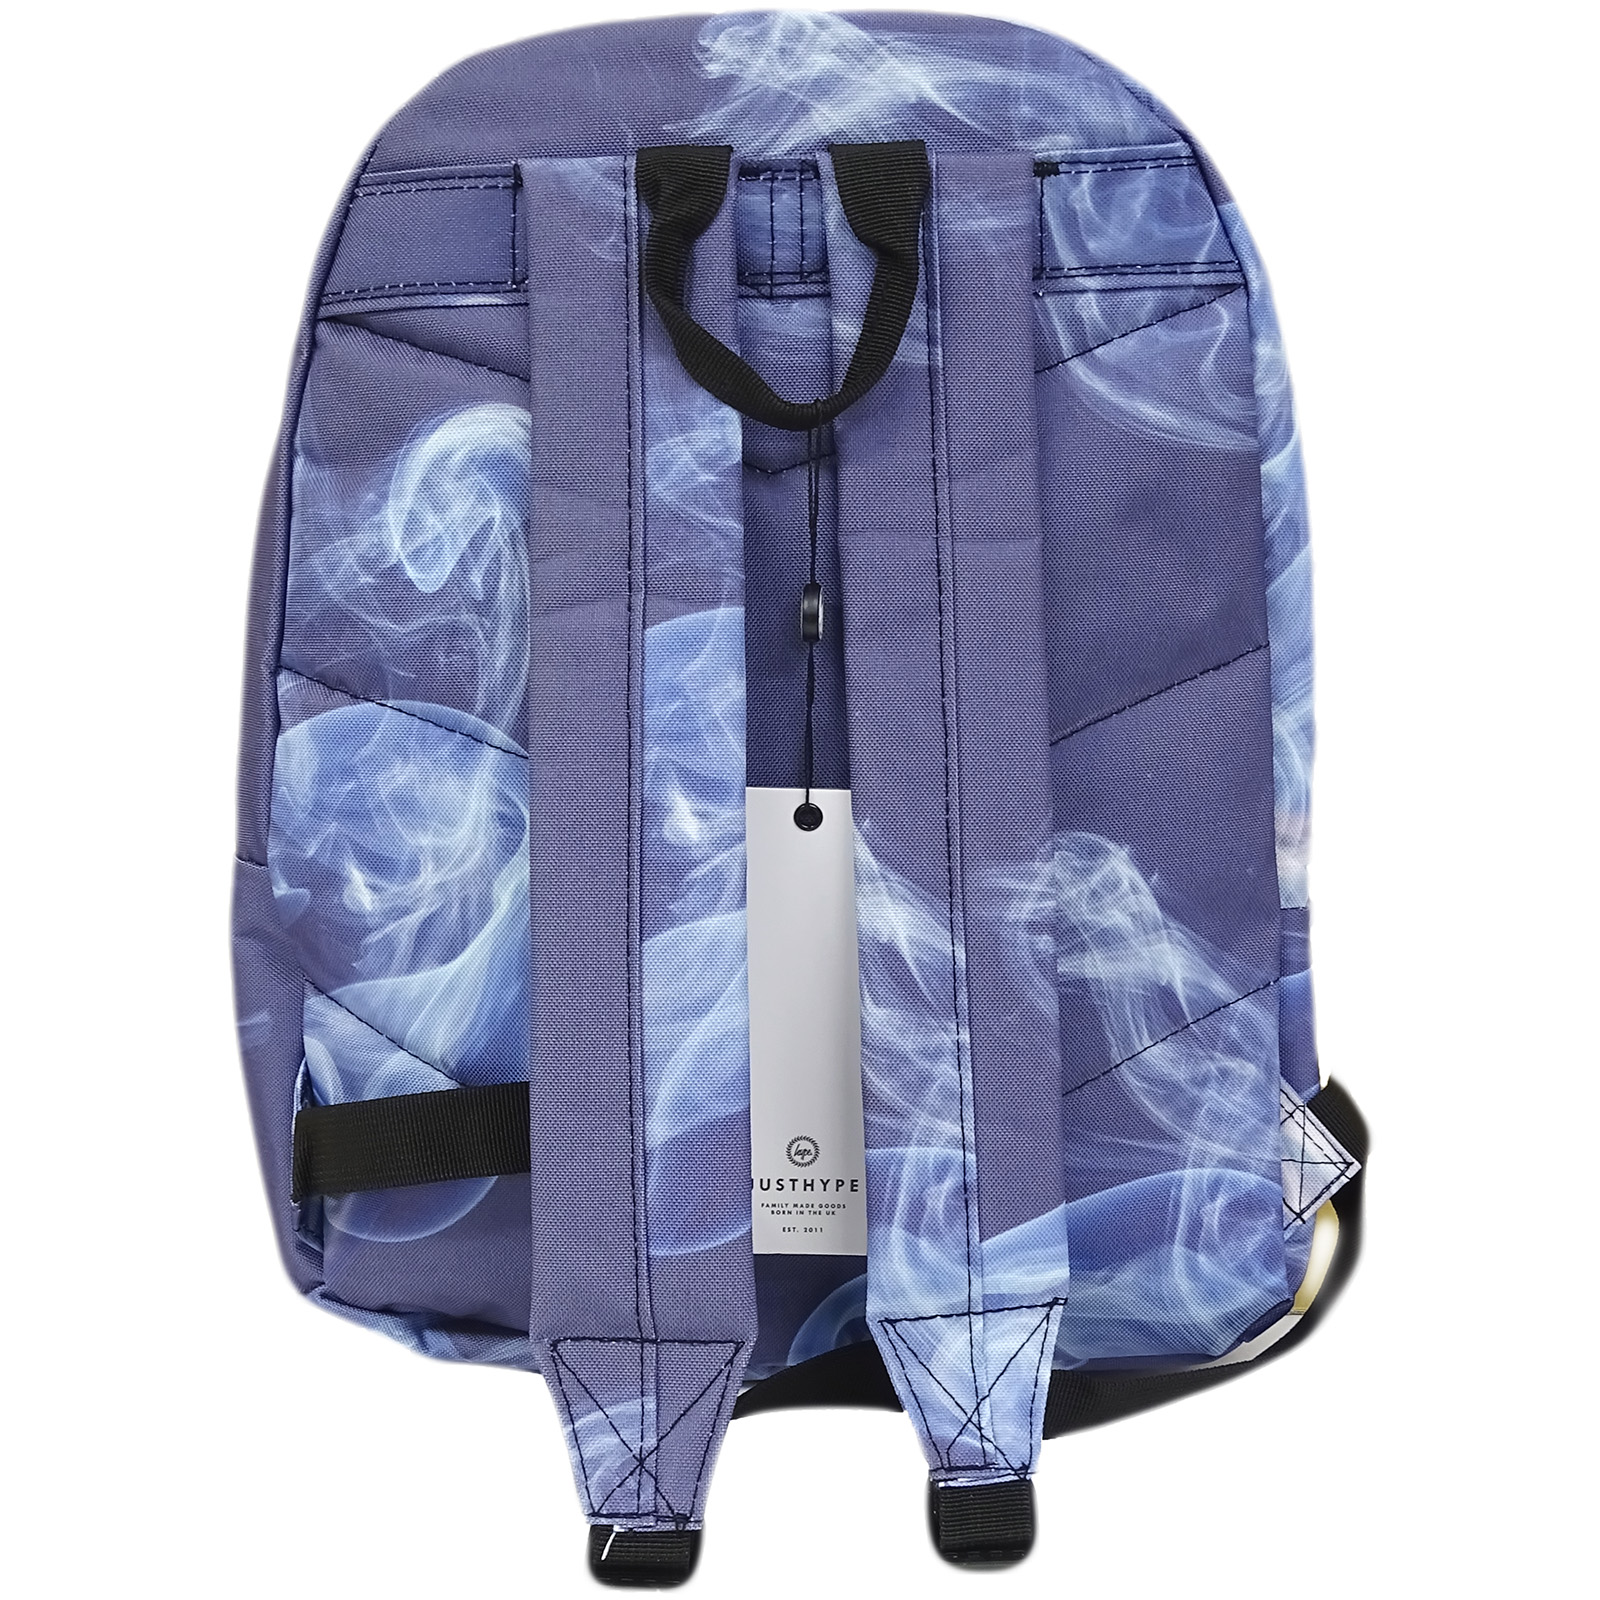 Unisexe-Hype-Sac-A-Dos-Ecole-Gym-SACS-pochettes-pencil-case miniature 53